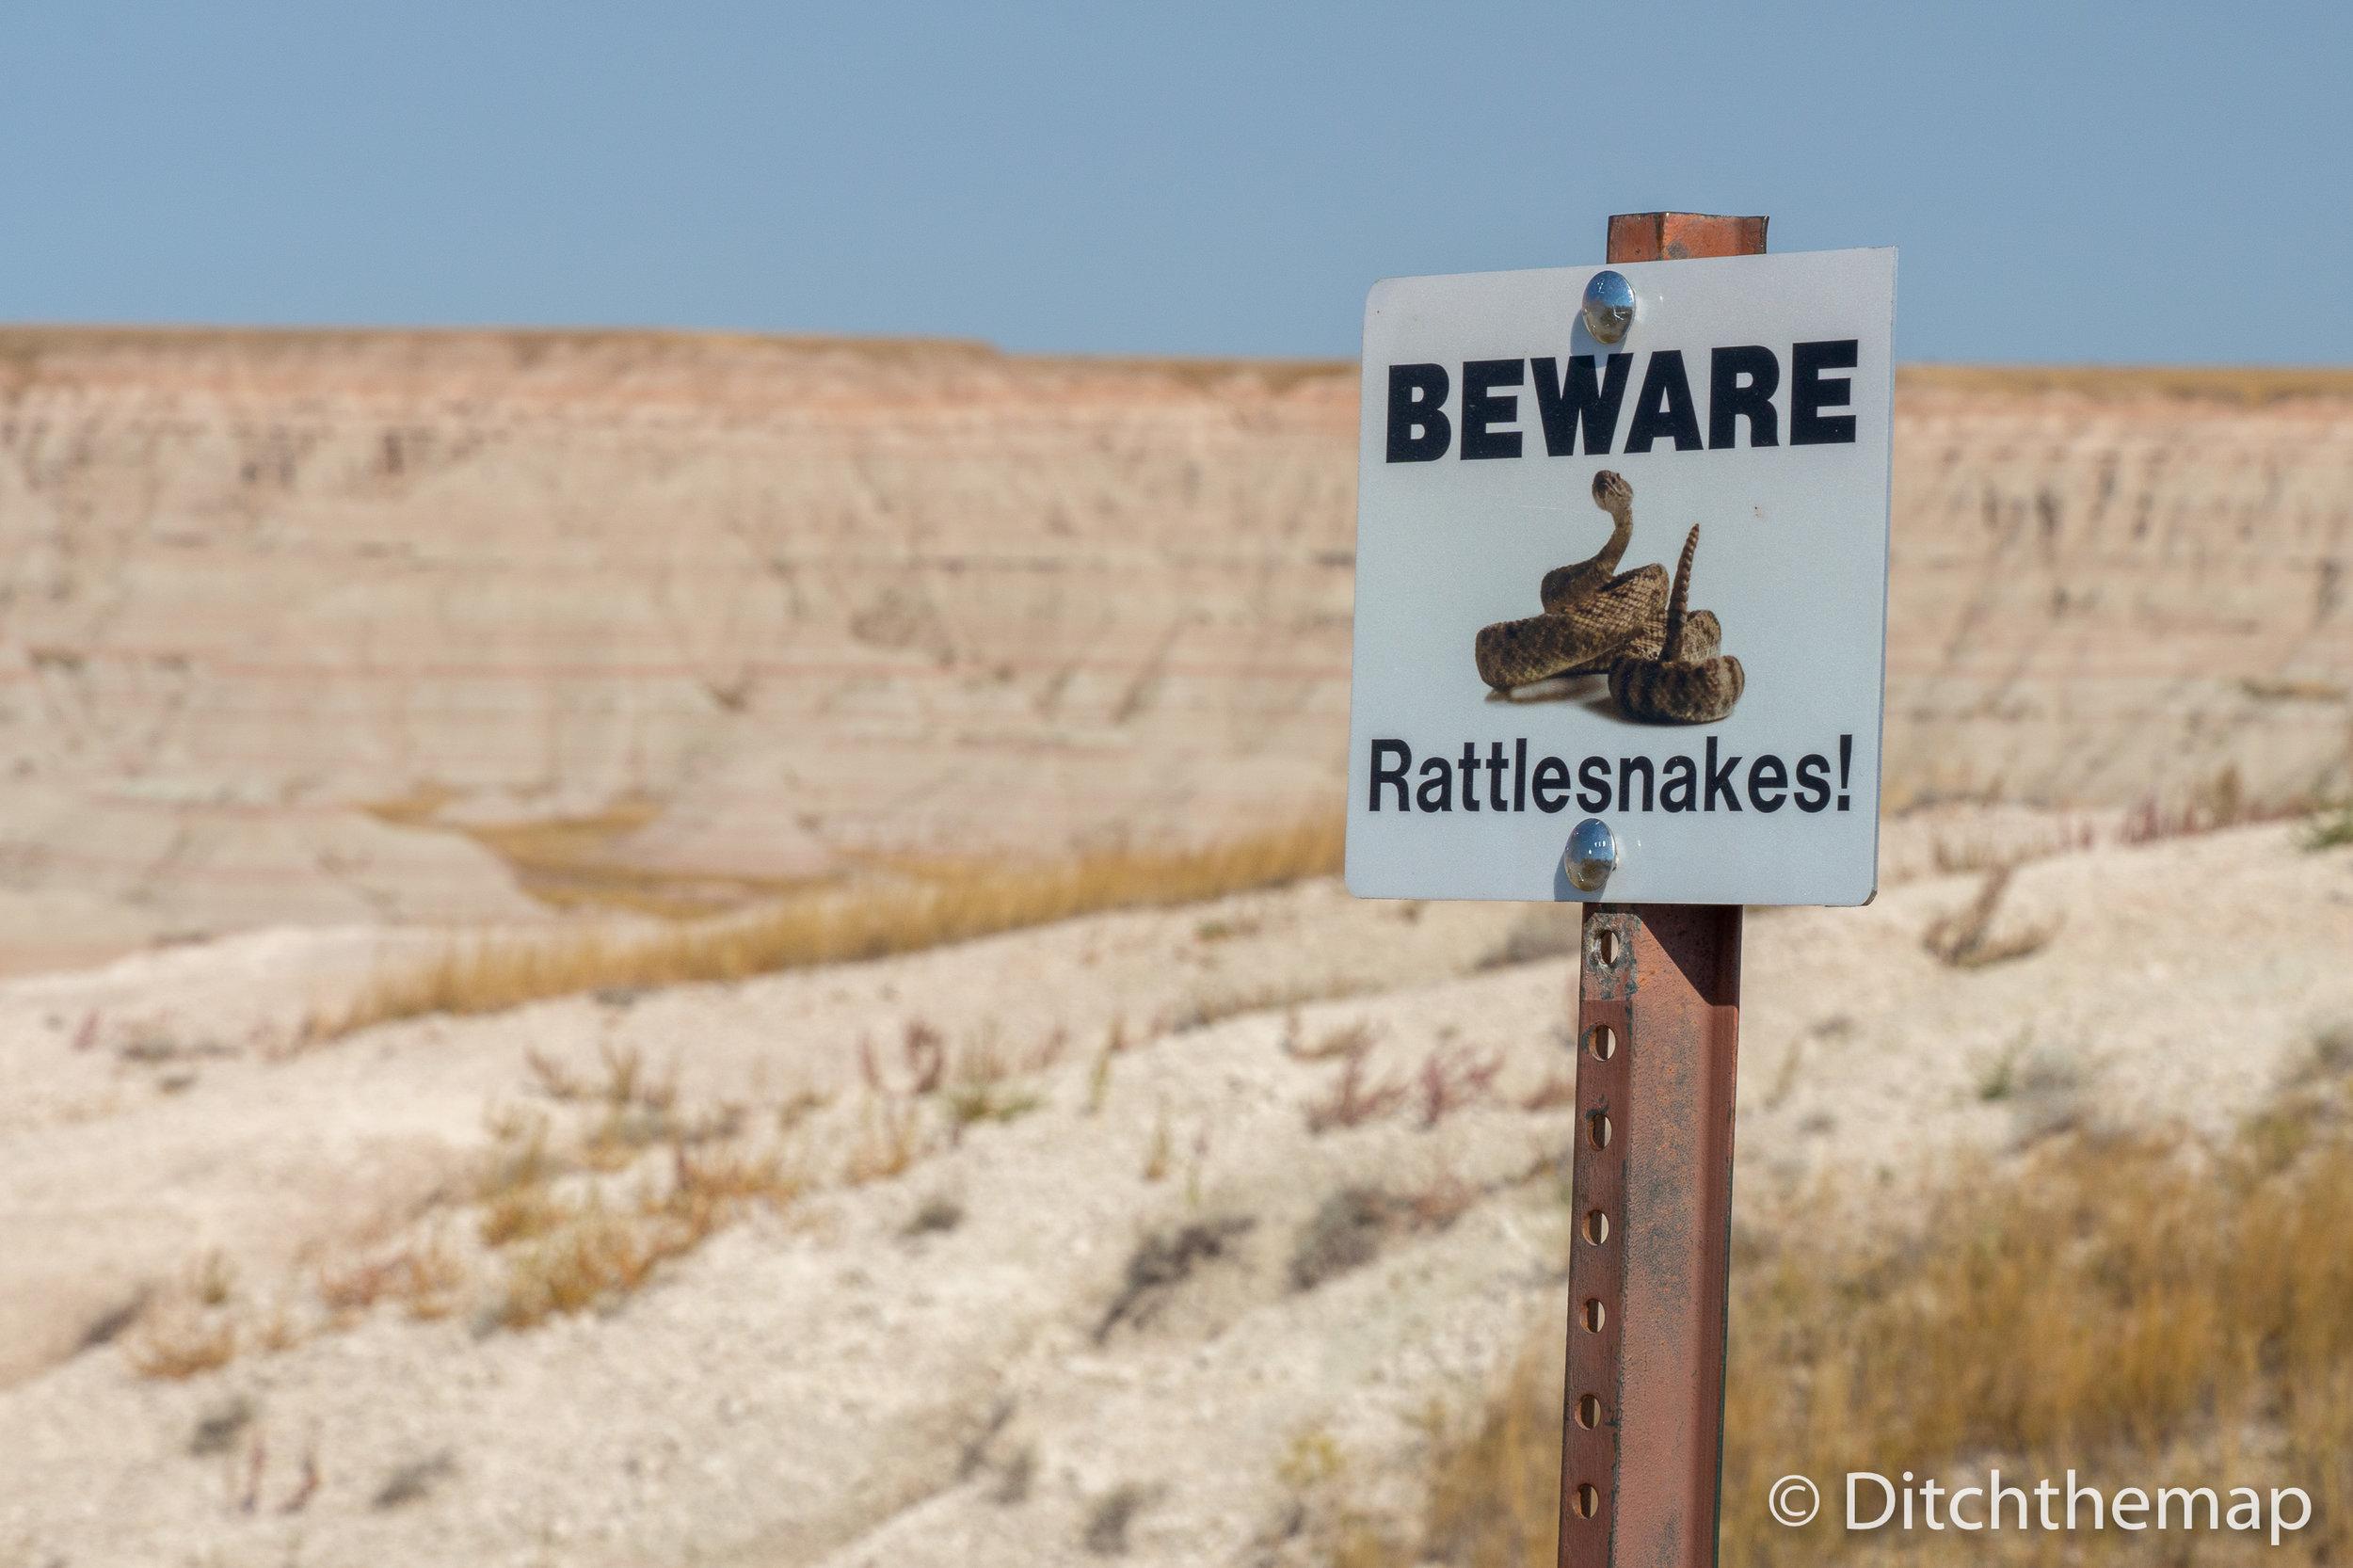 Beware of Rattlesnakes signpost in the Badlands South, Dakota